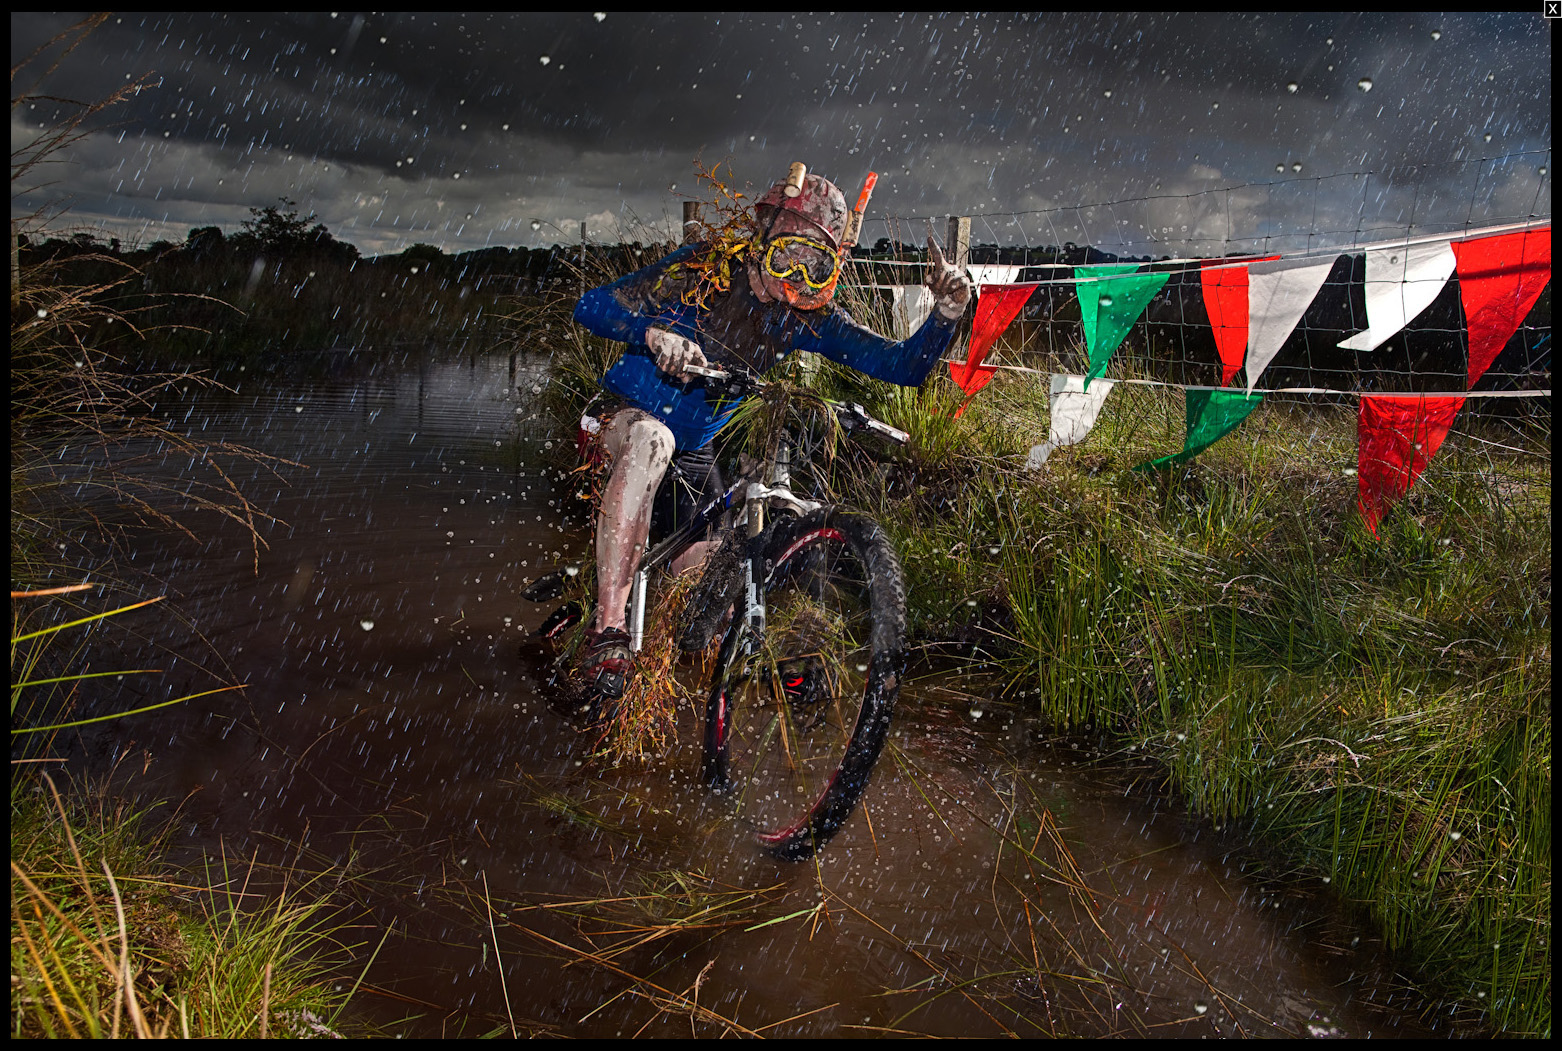 World Bog Cycling Champion